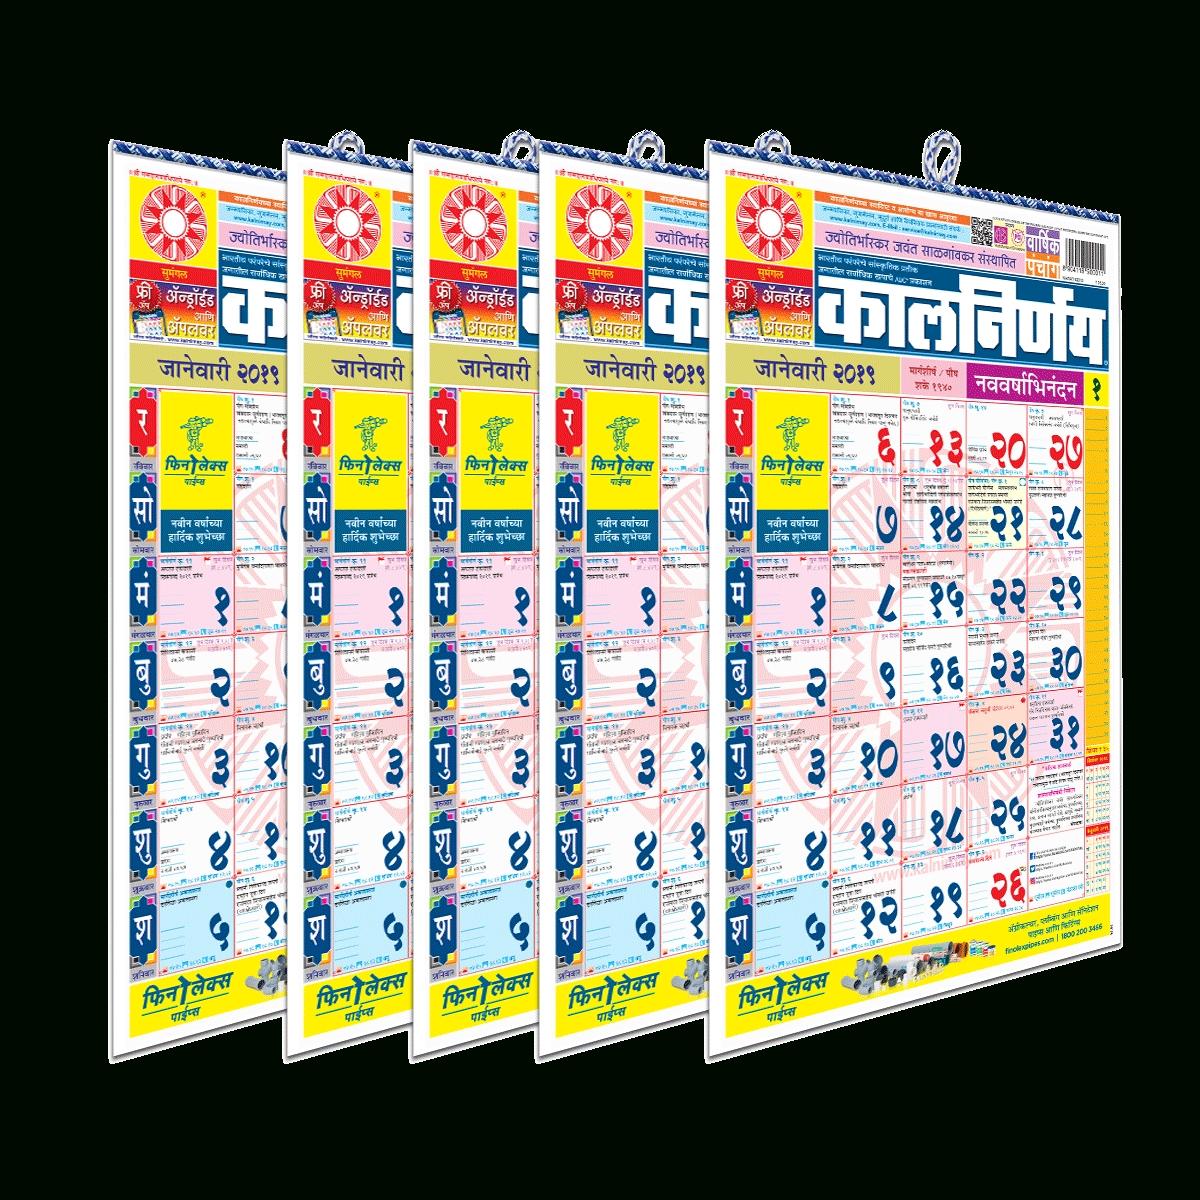 Kalnirnay | India's Premier Almanac Maker | Buy Calmanac Online for Kalnirnay 2020 Holidays